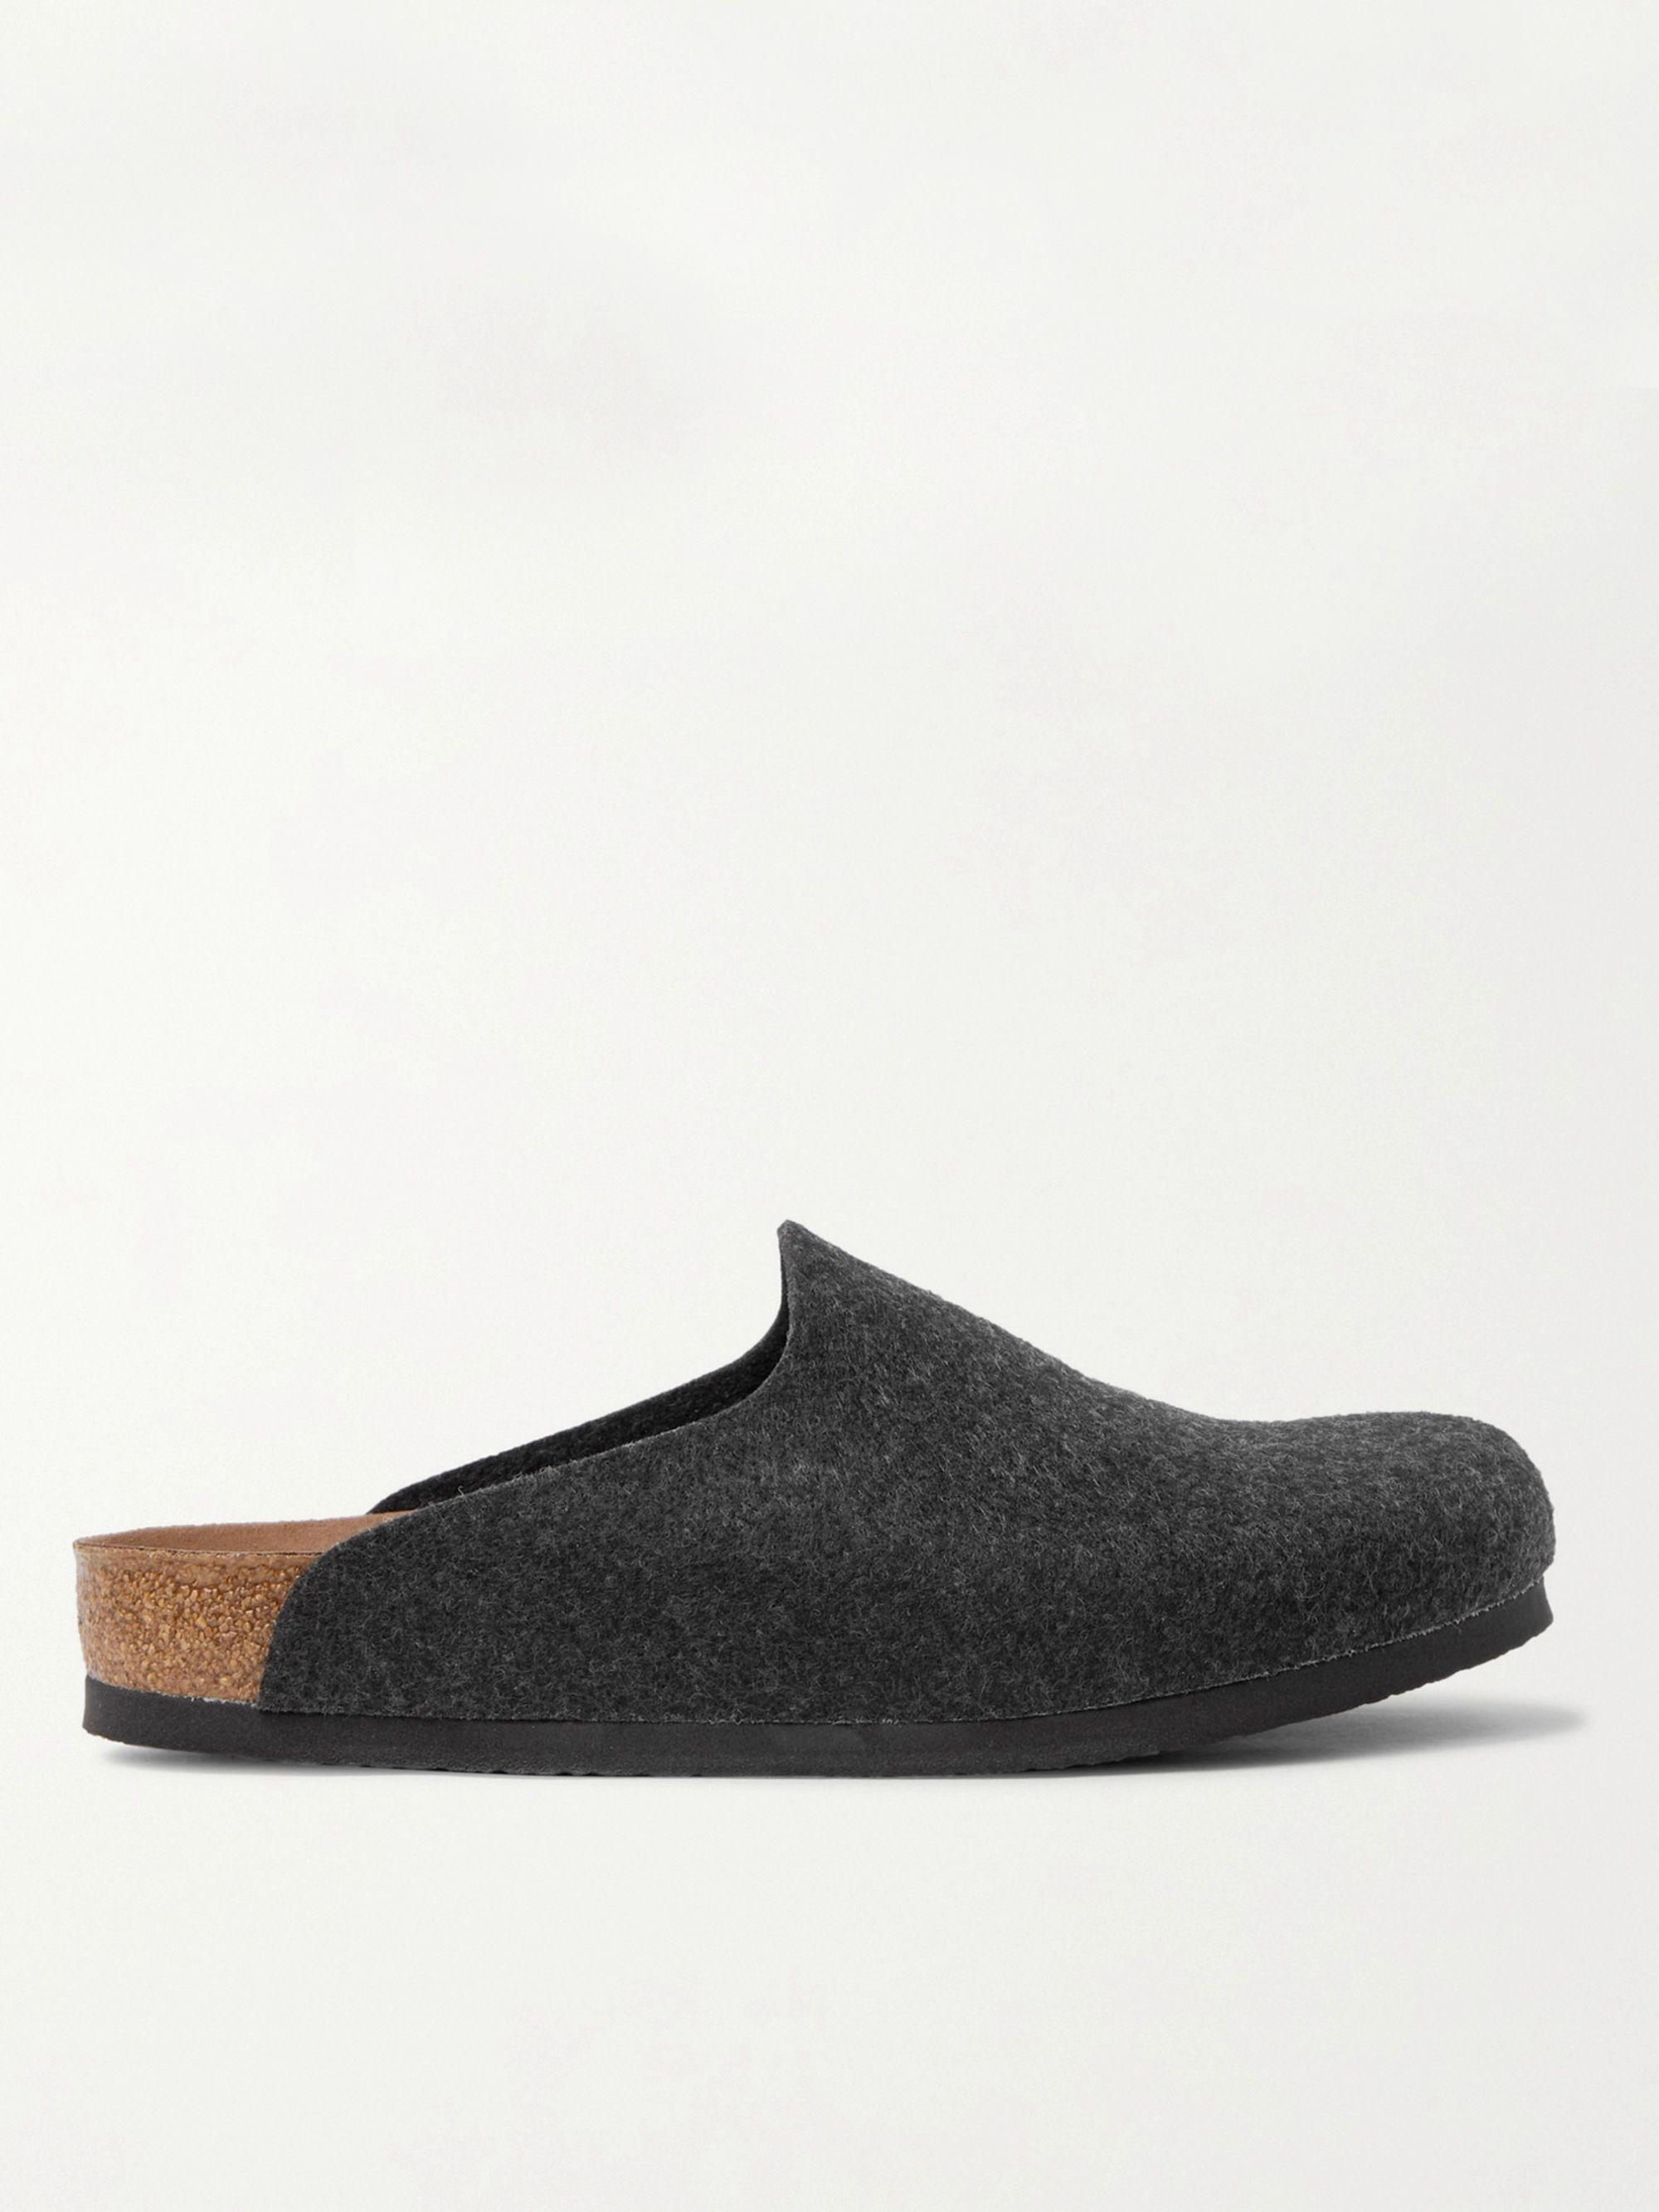 Birkenstock Amsterdam Felt Slippers,Dark gray